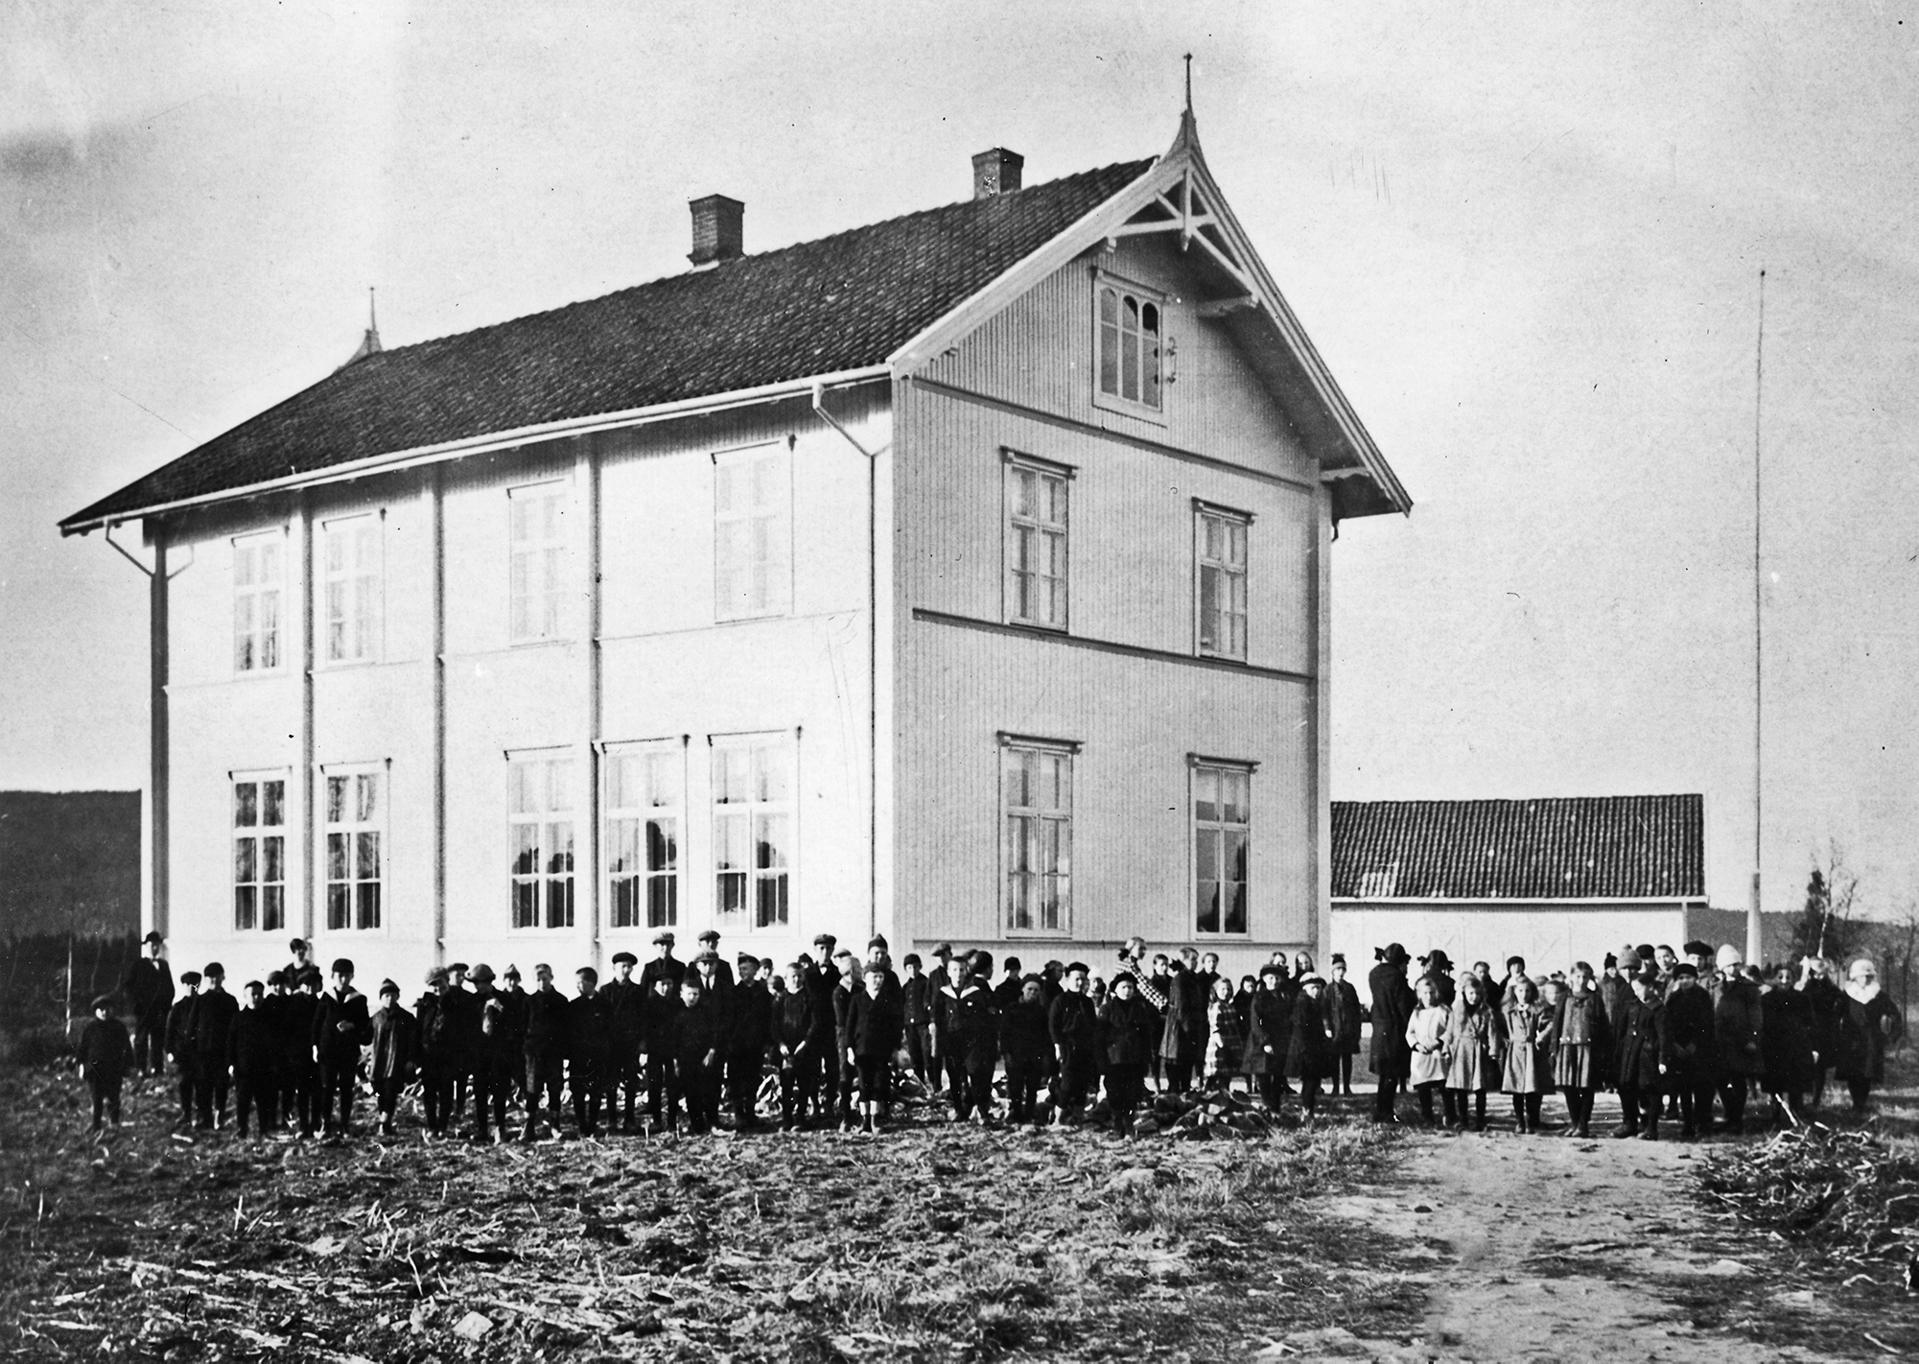 2021-05_Sørumsand-Østby-skole-os183.jpg